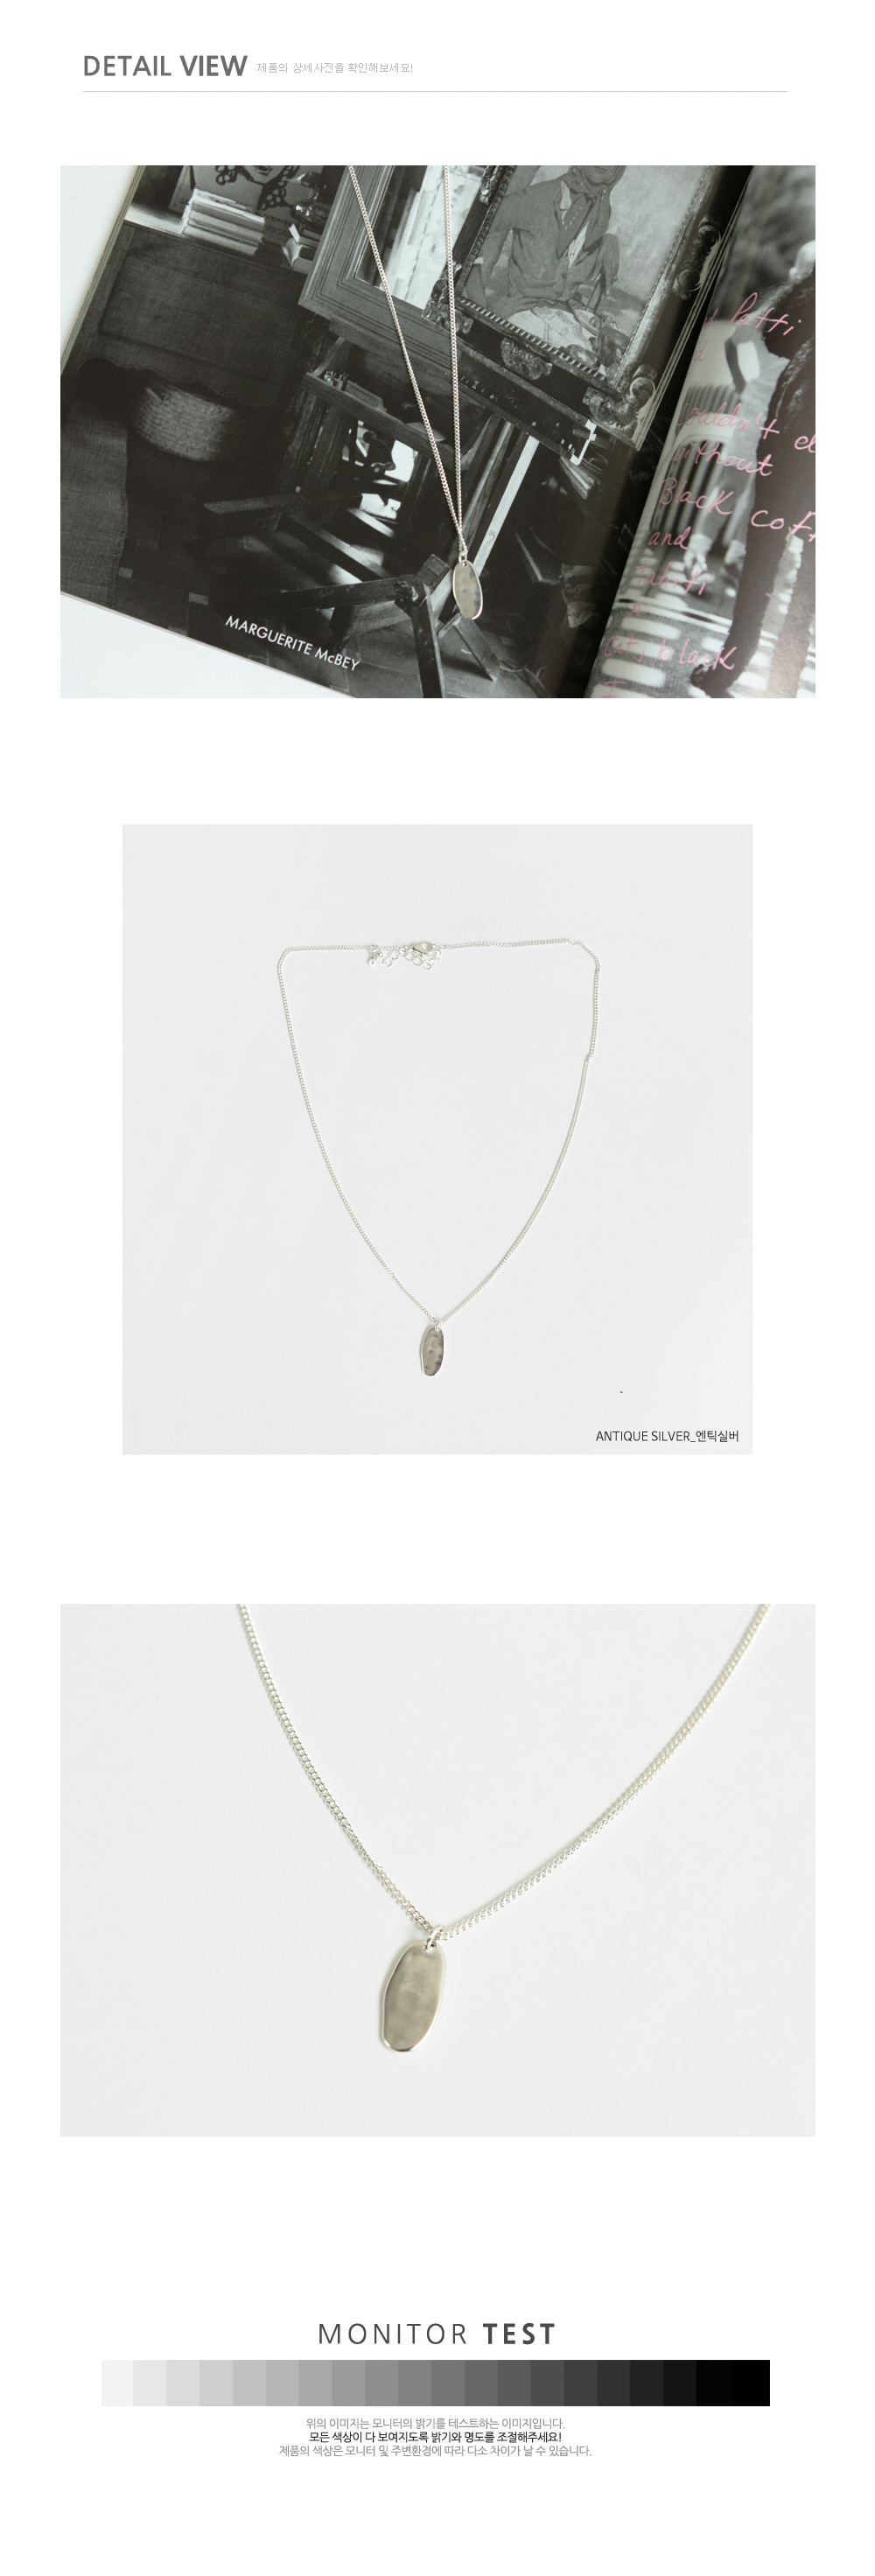 Antique silver-necklace